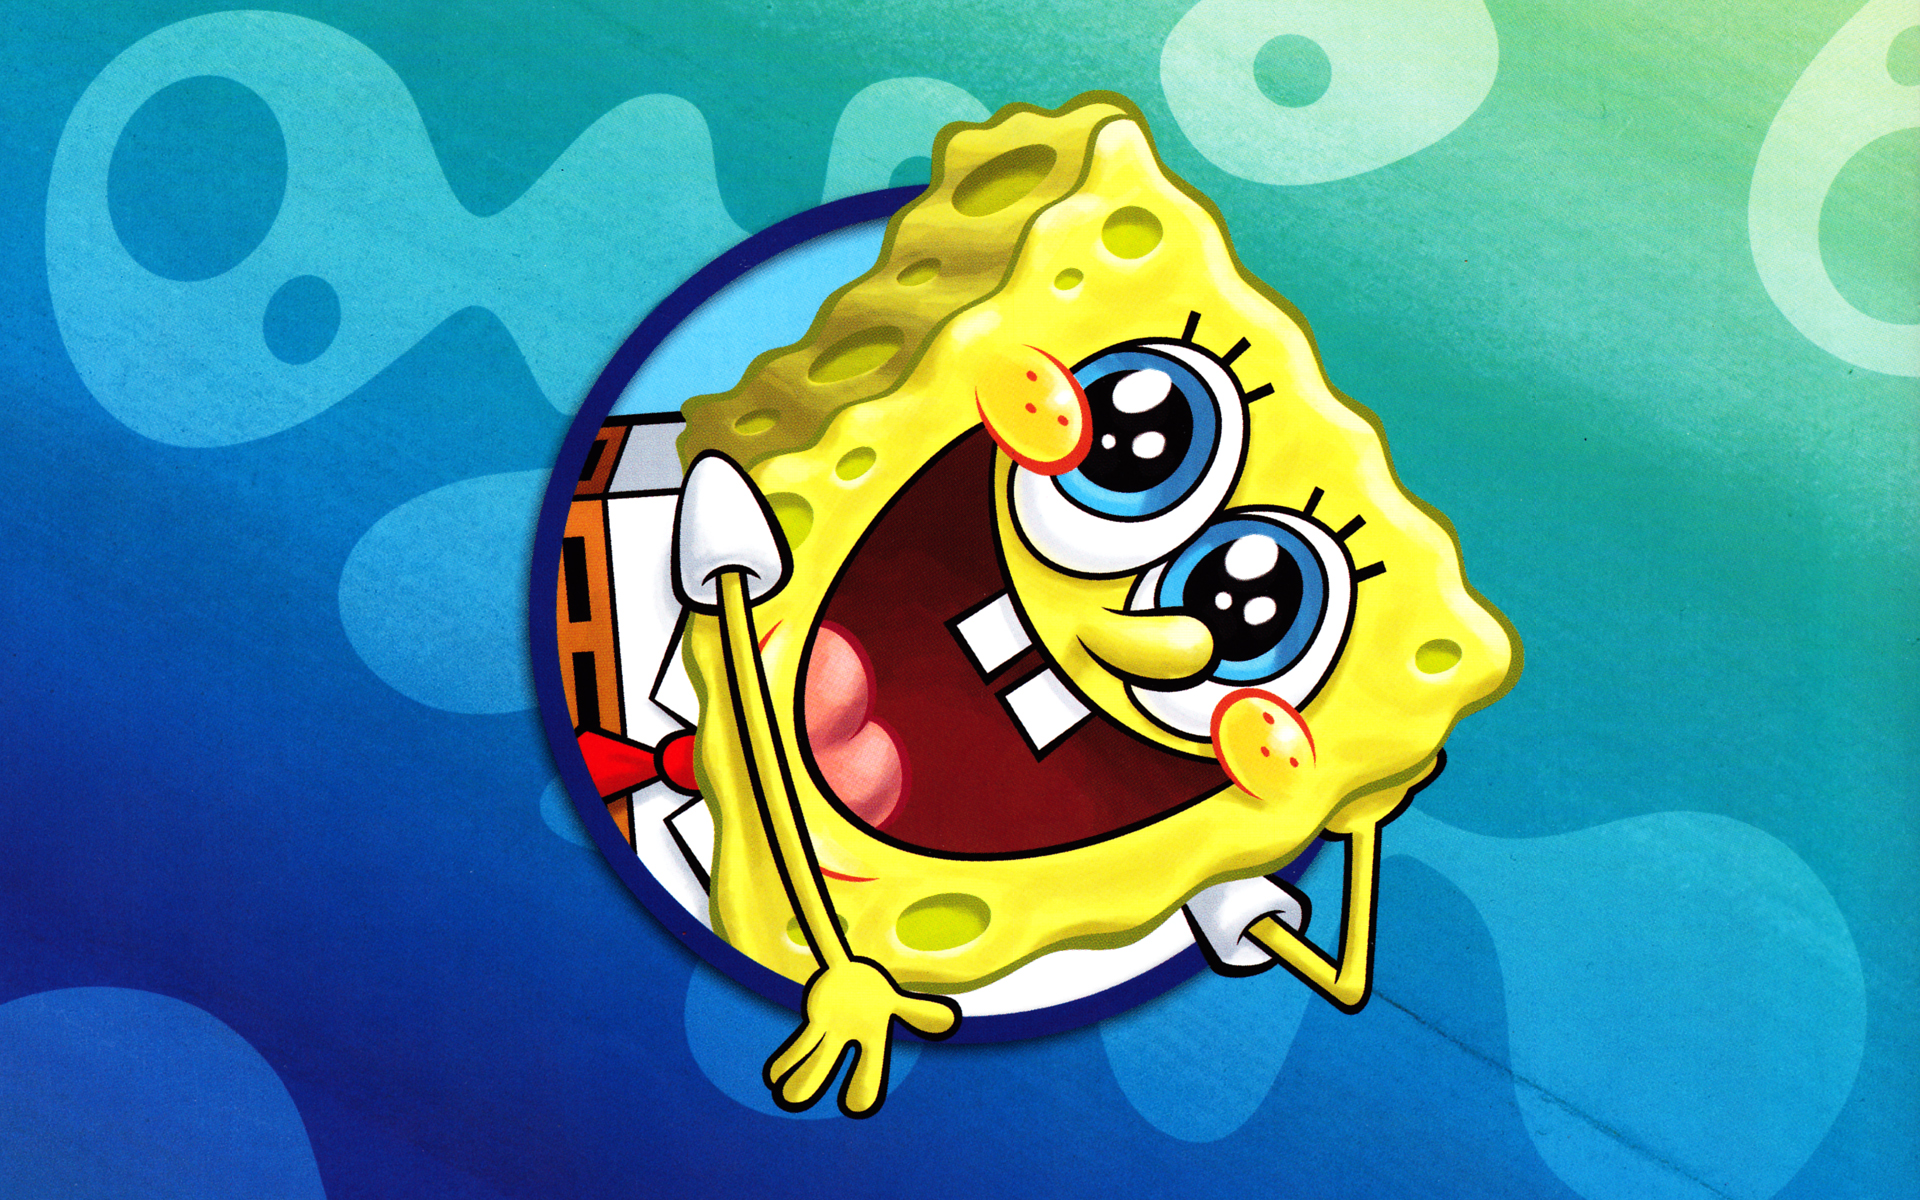 SpongeBob SquarePants wallpapers HD happy